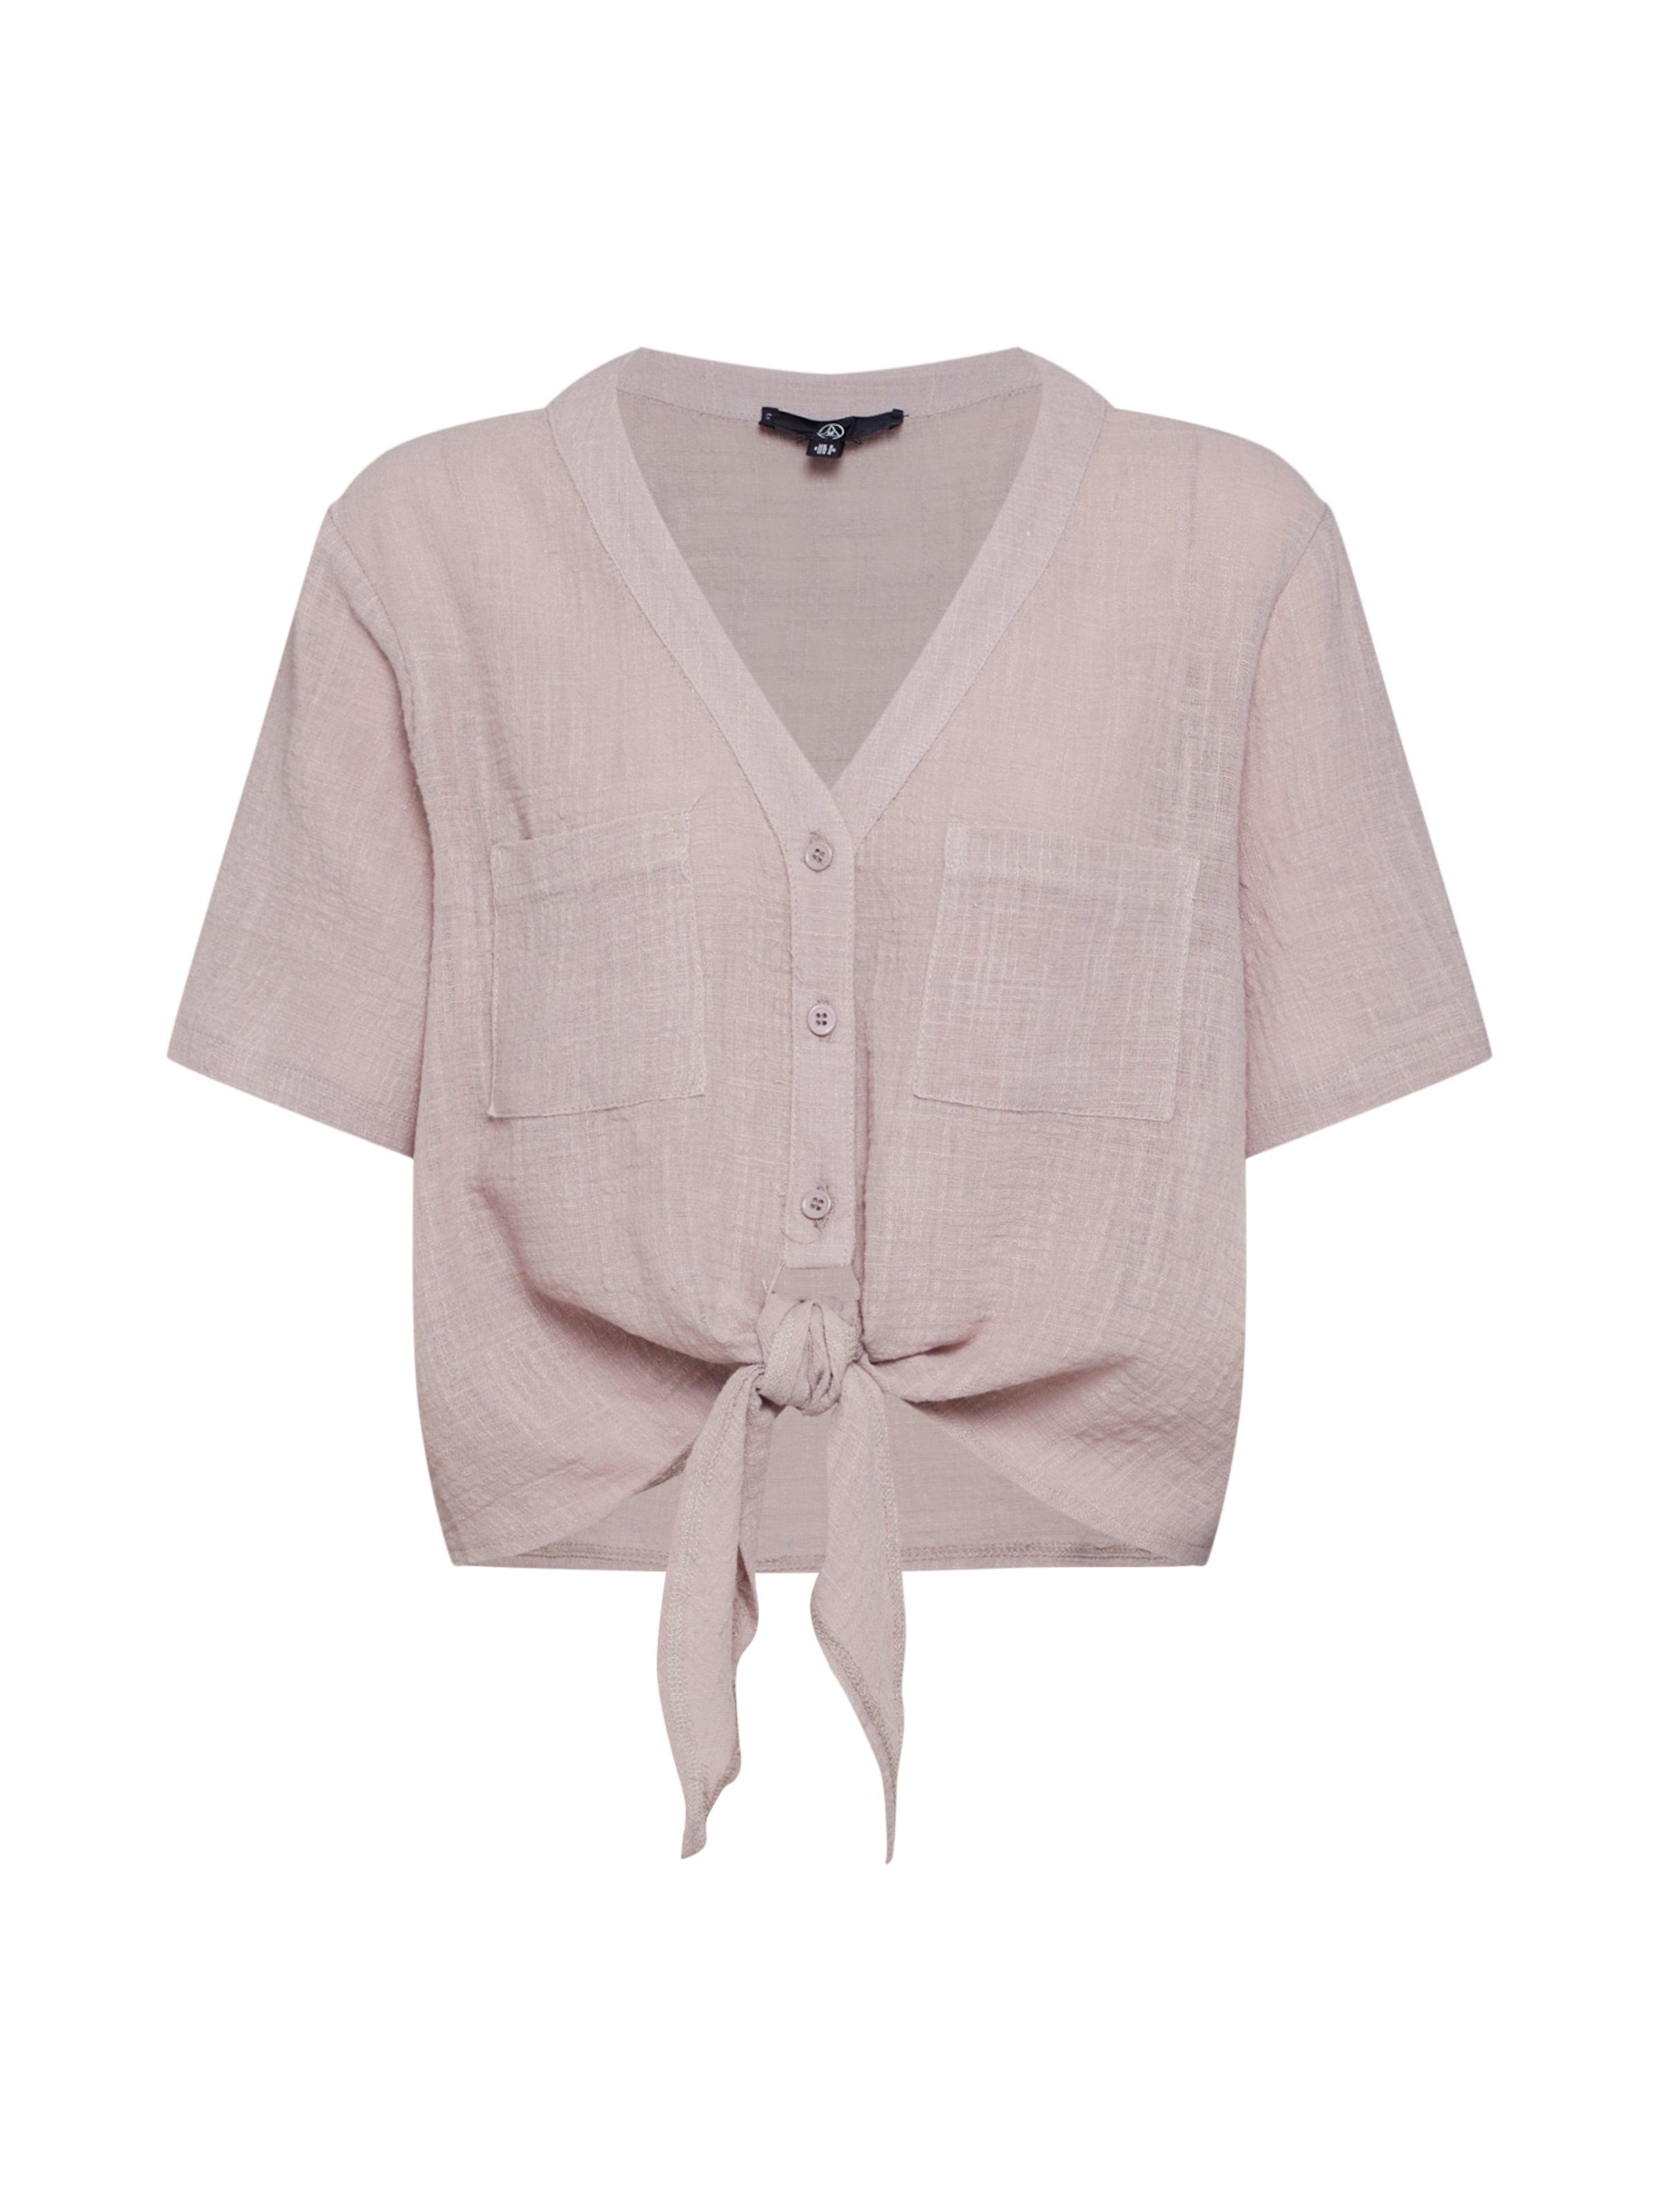 Missguided En T 'tie Crop Front Linen Shirt' shirt Taupe vnwN0O8m